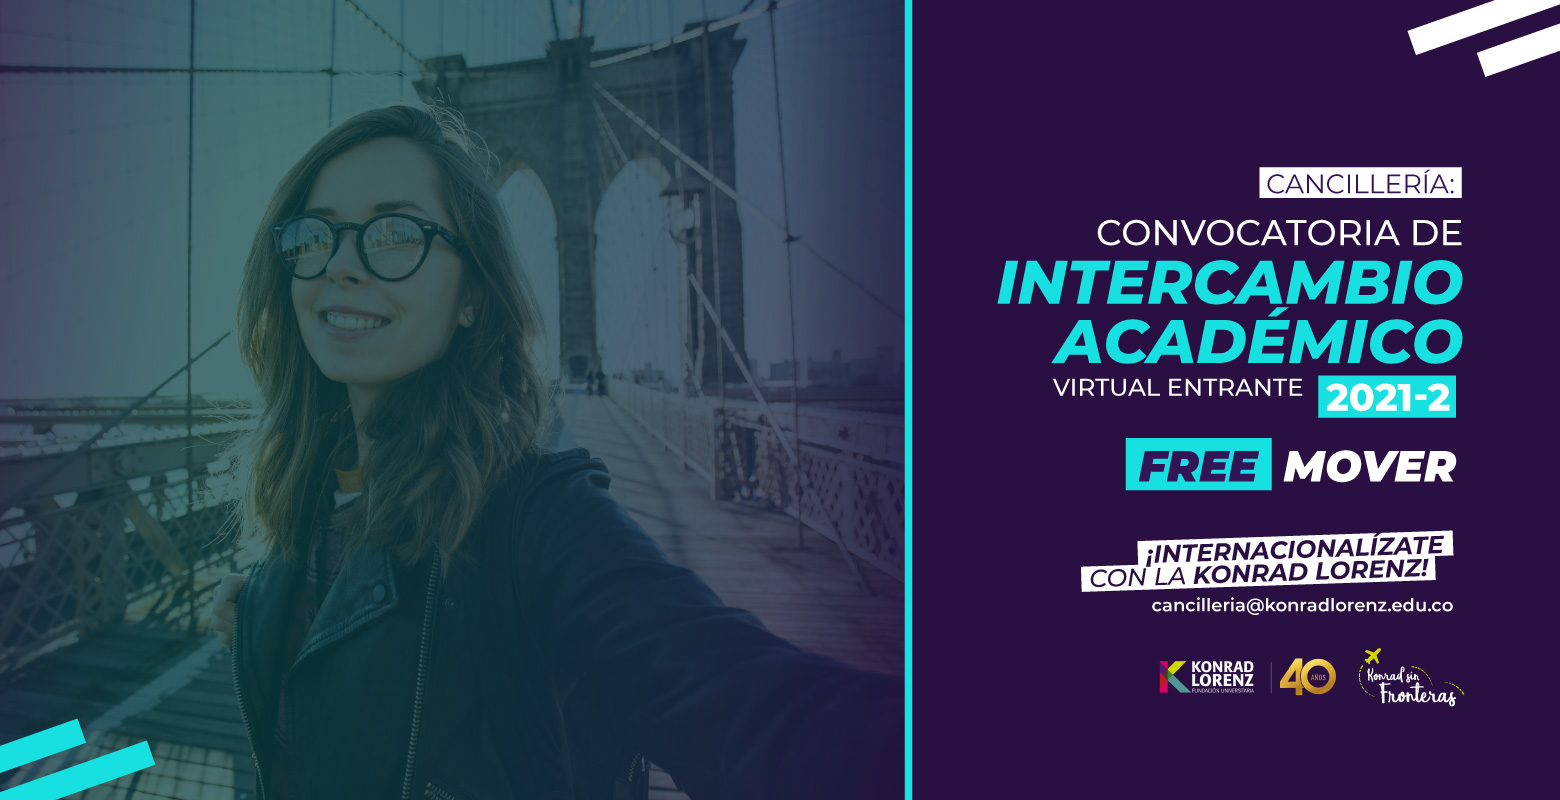 Cancillería: Convocatoria de Intercambio Académico Virtual Entrante 2021-2 - Free Mover